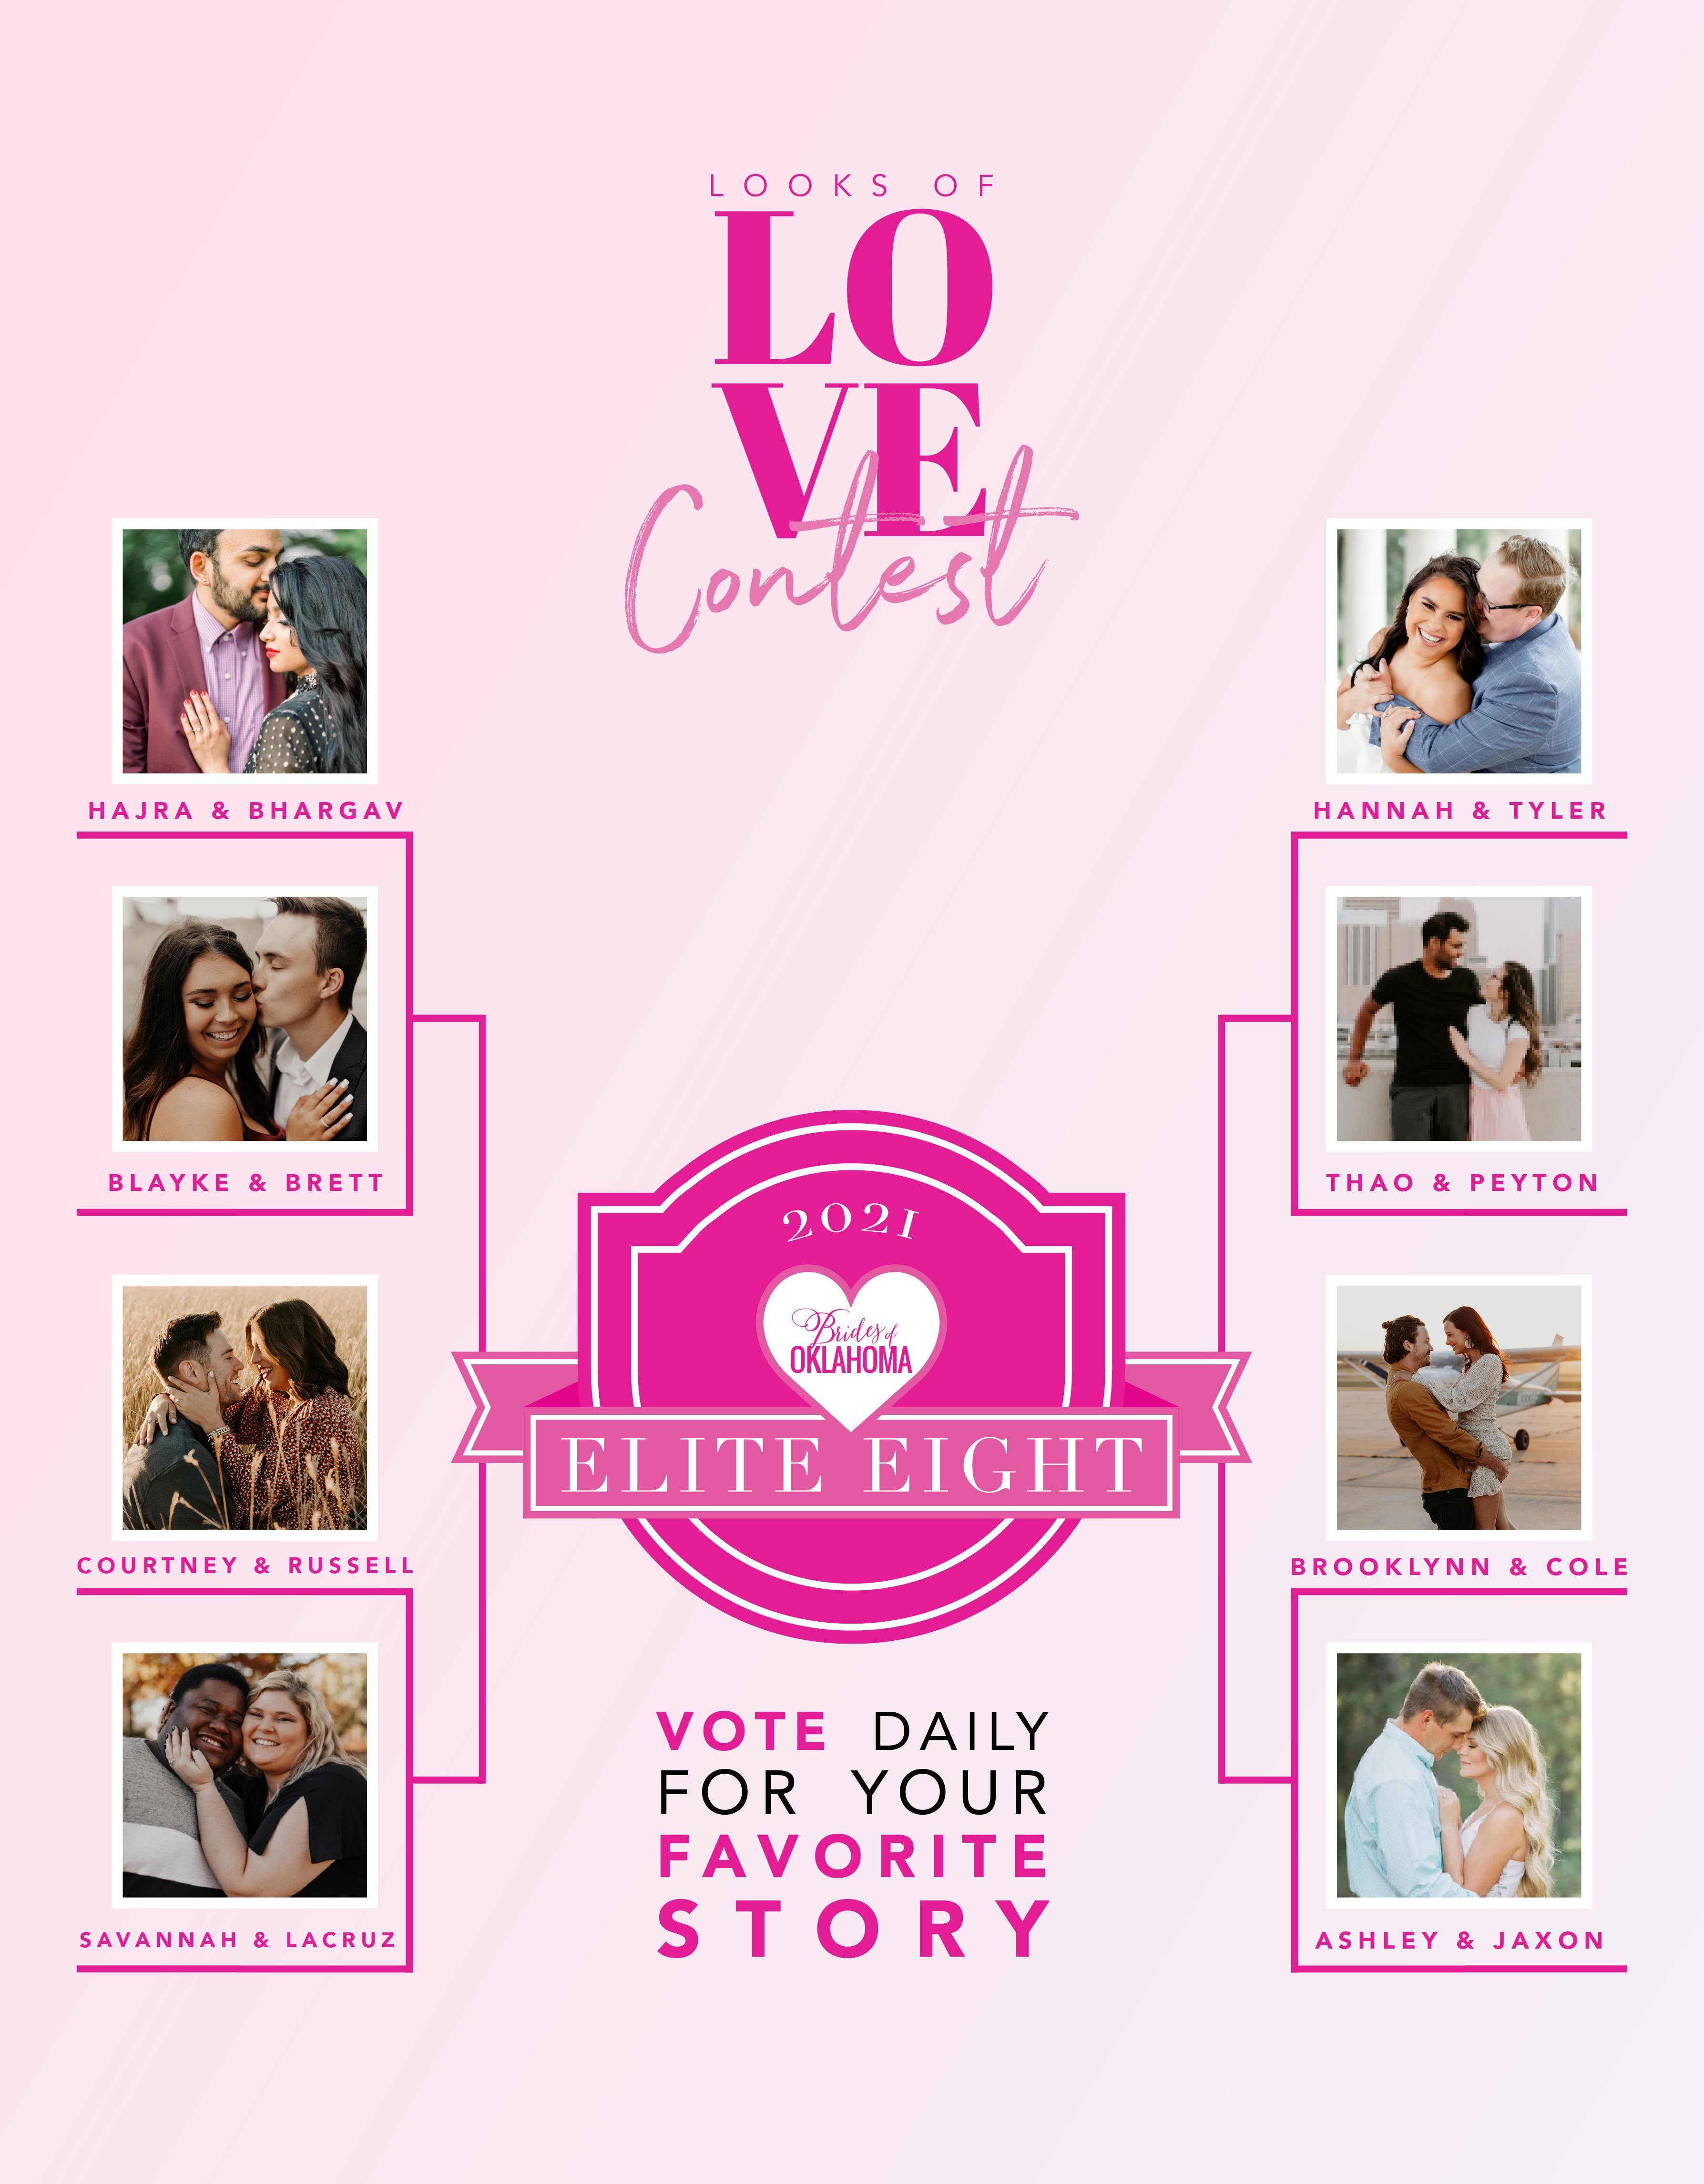 Looks of Love Contest 2021